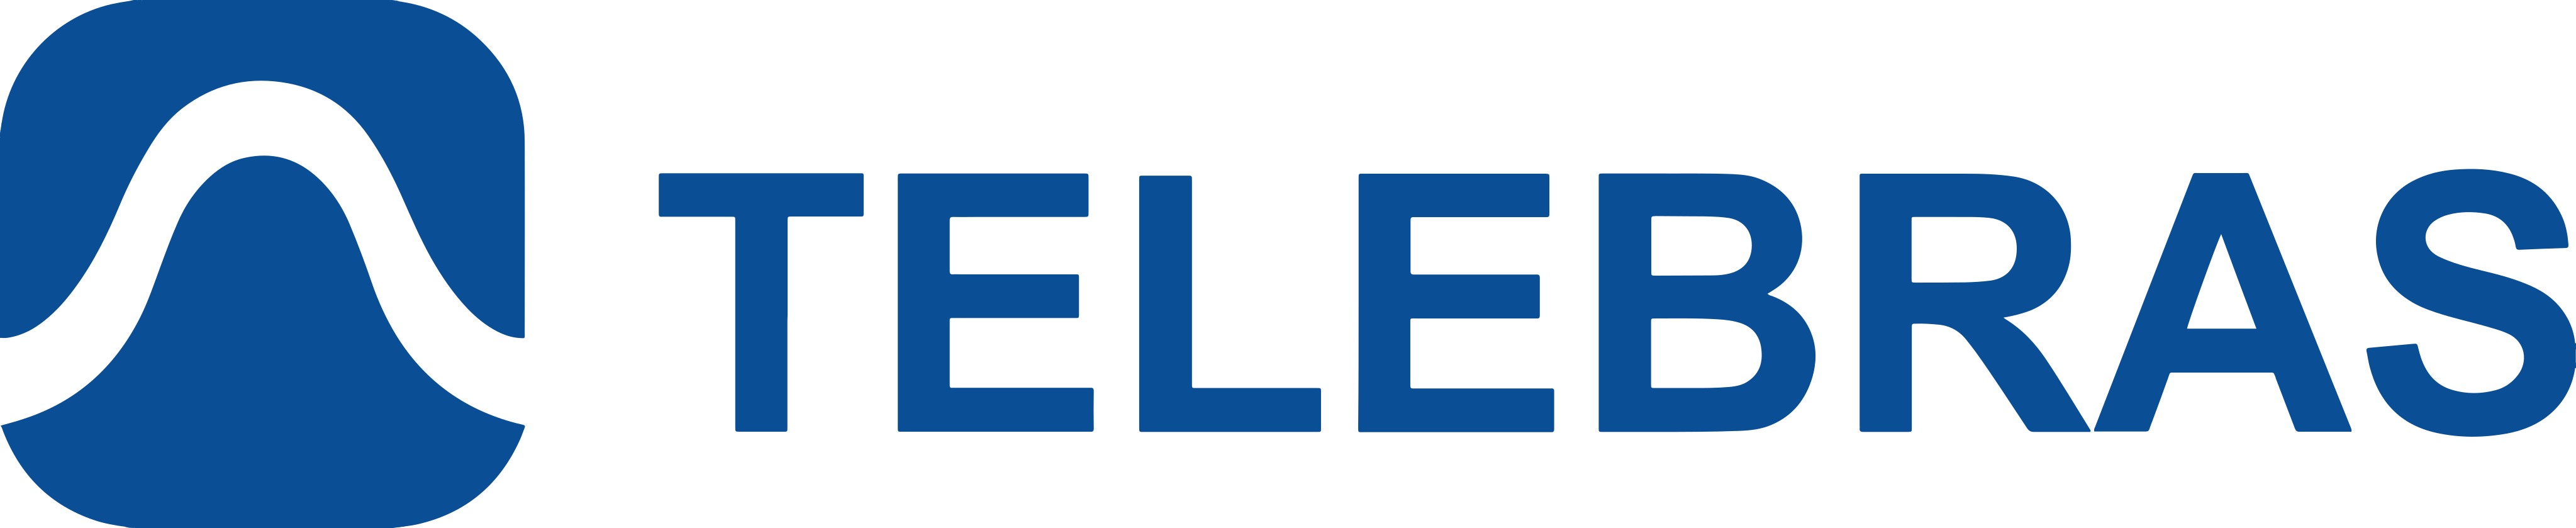 Telebras Logo.